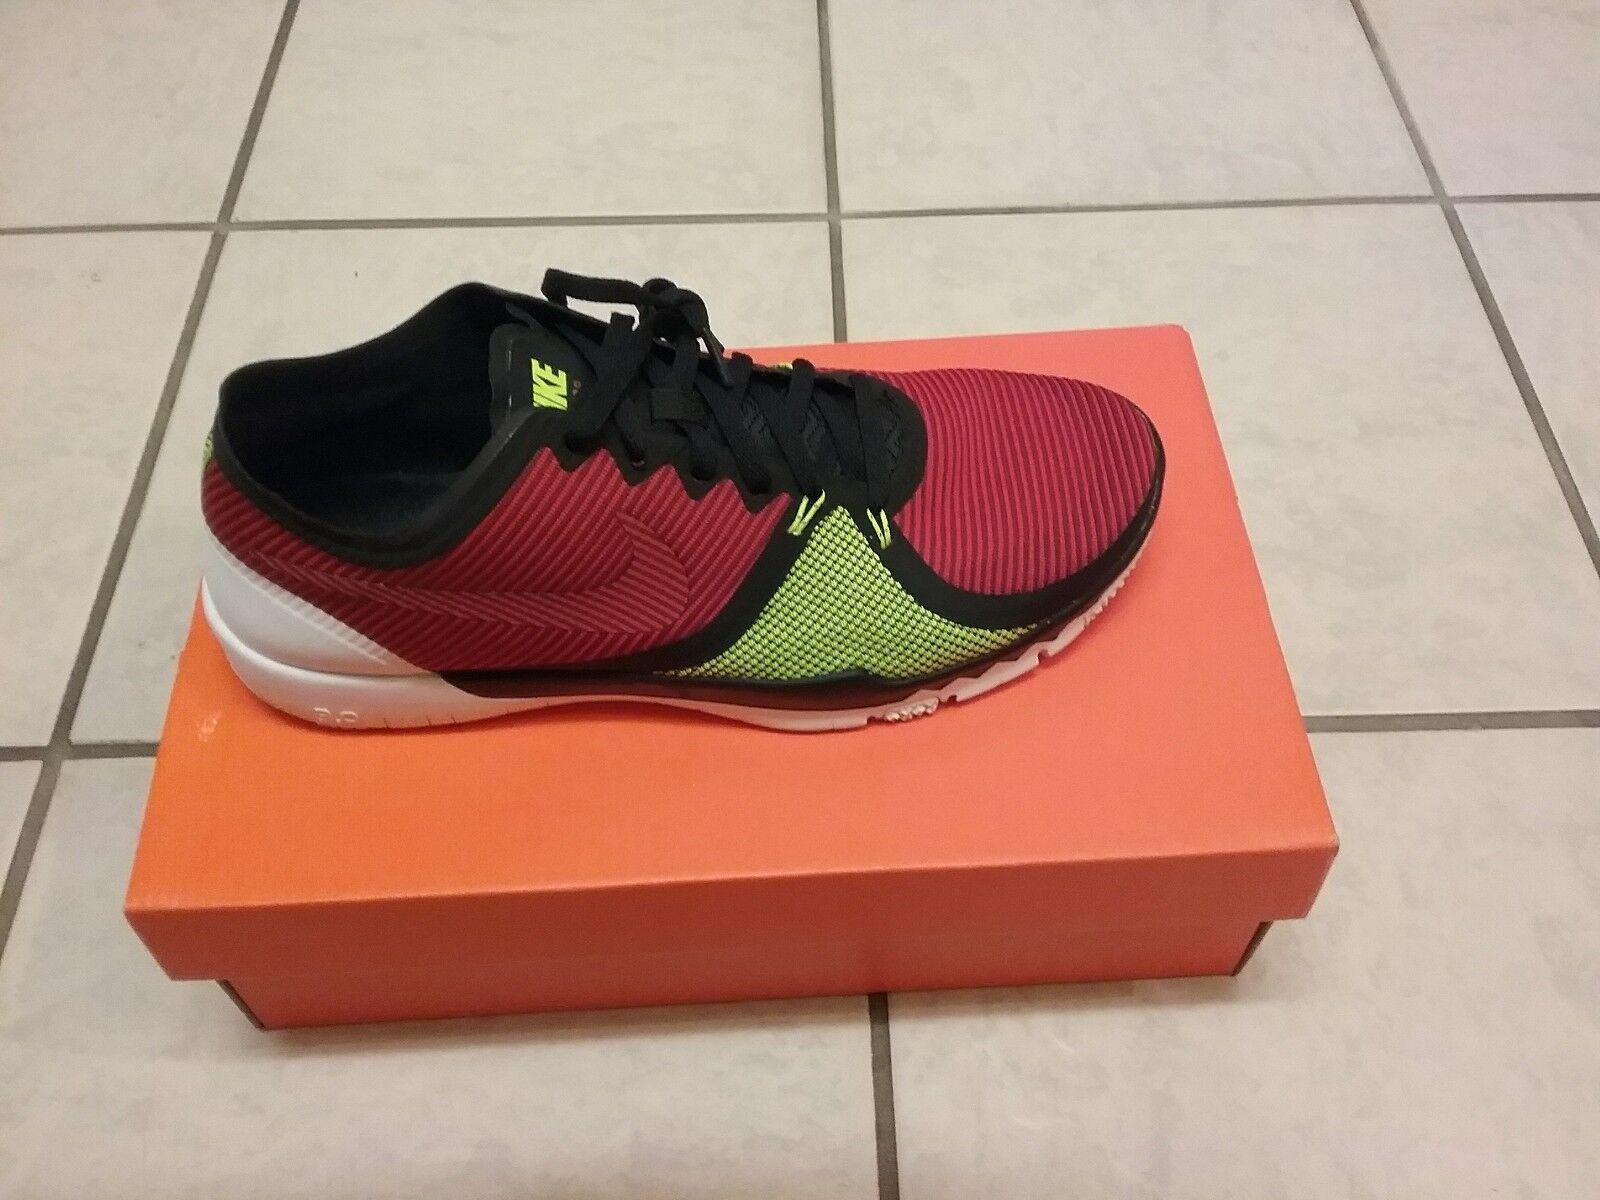 the latest 62b71 f6ec8 NEW NEW NEW Nike Free Trainer 3.0 V4 Training shoes Black Red Volt Sz 9  ca2de9